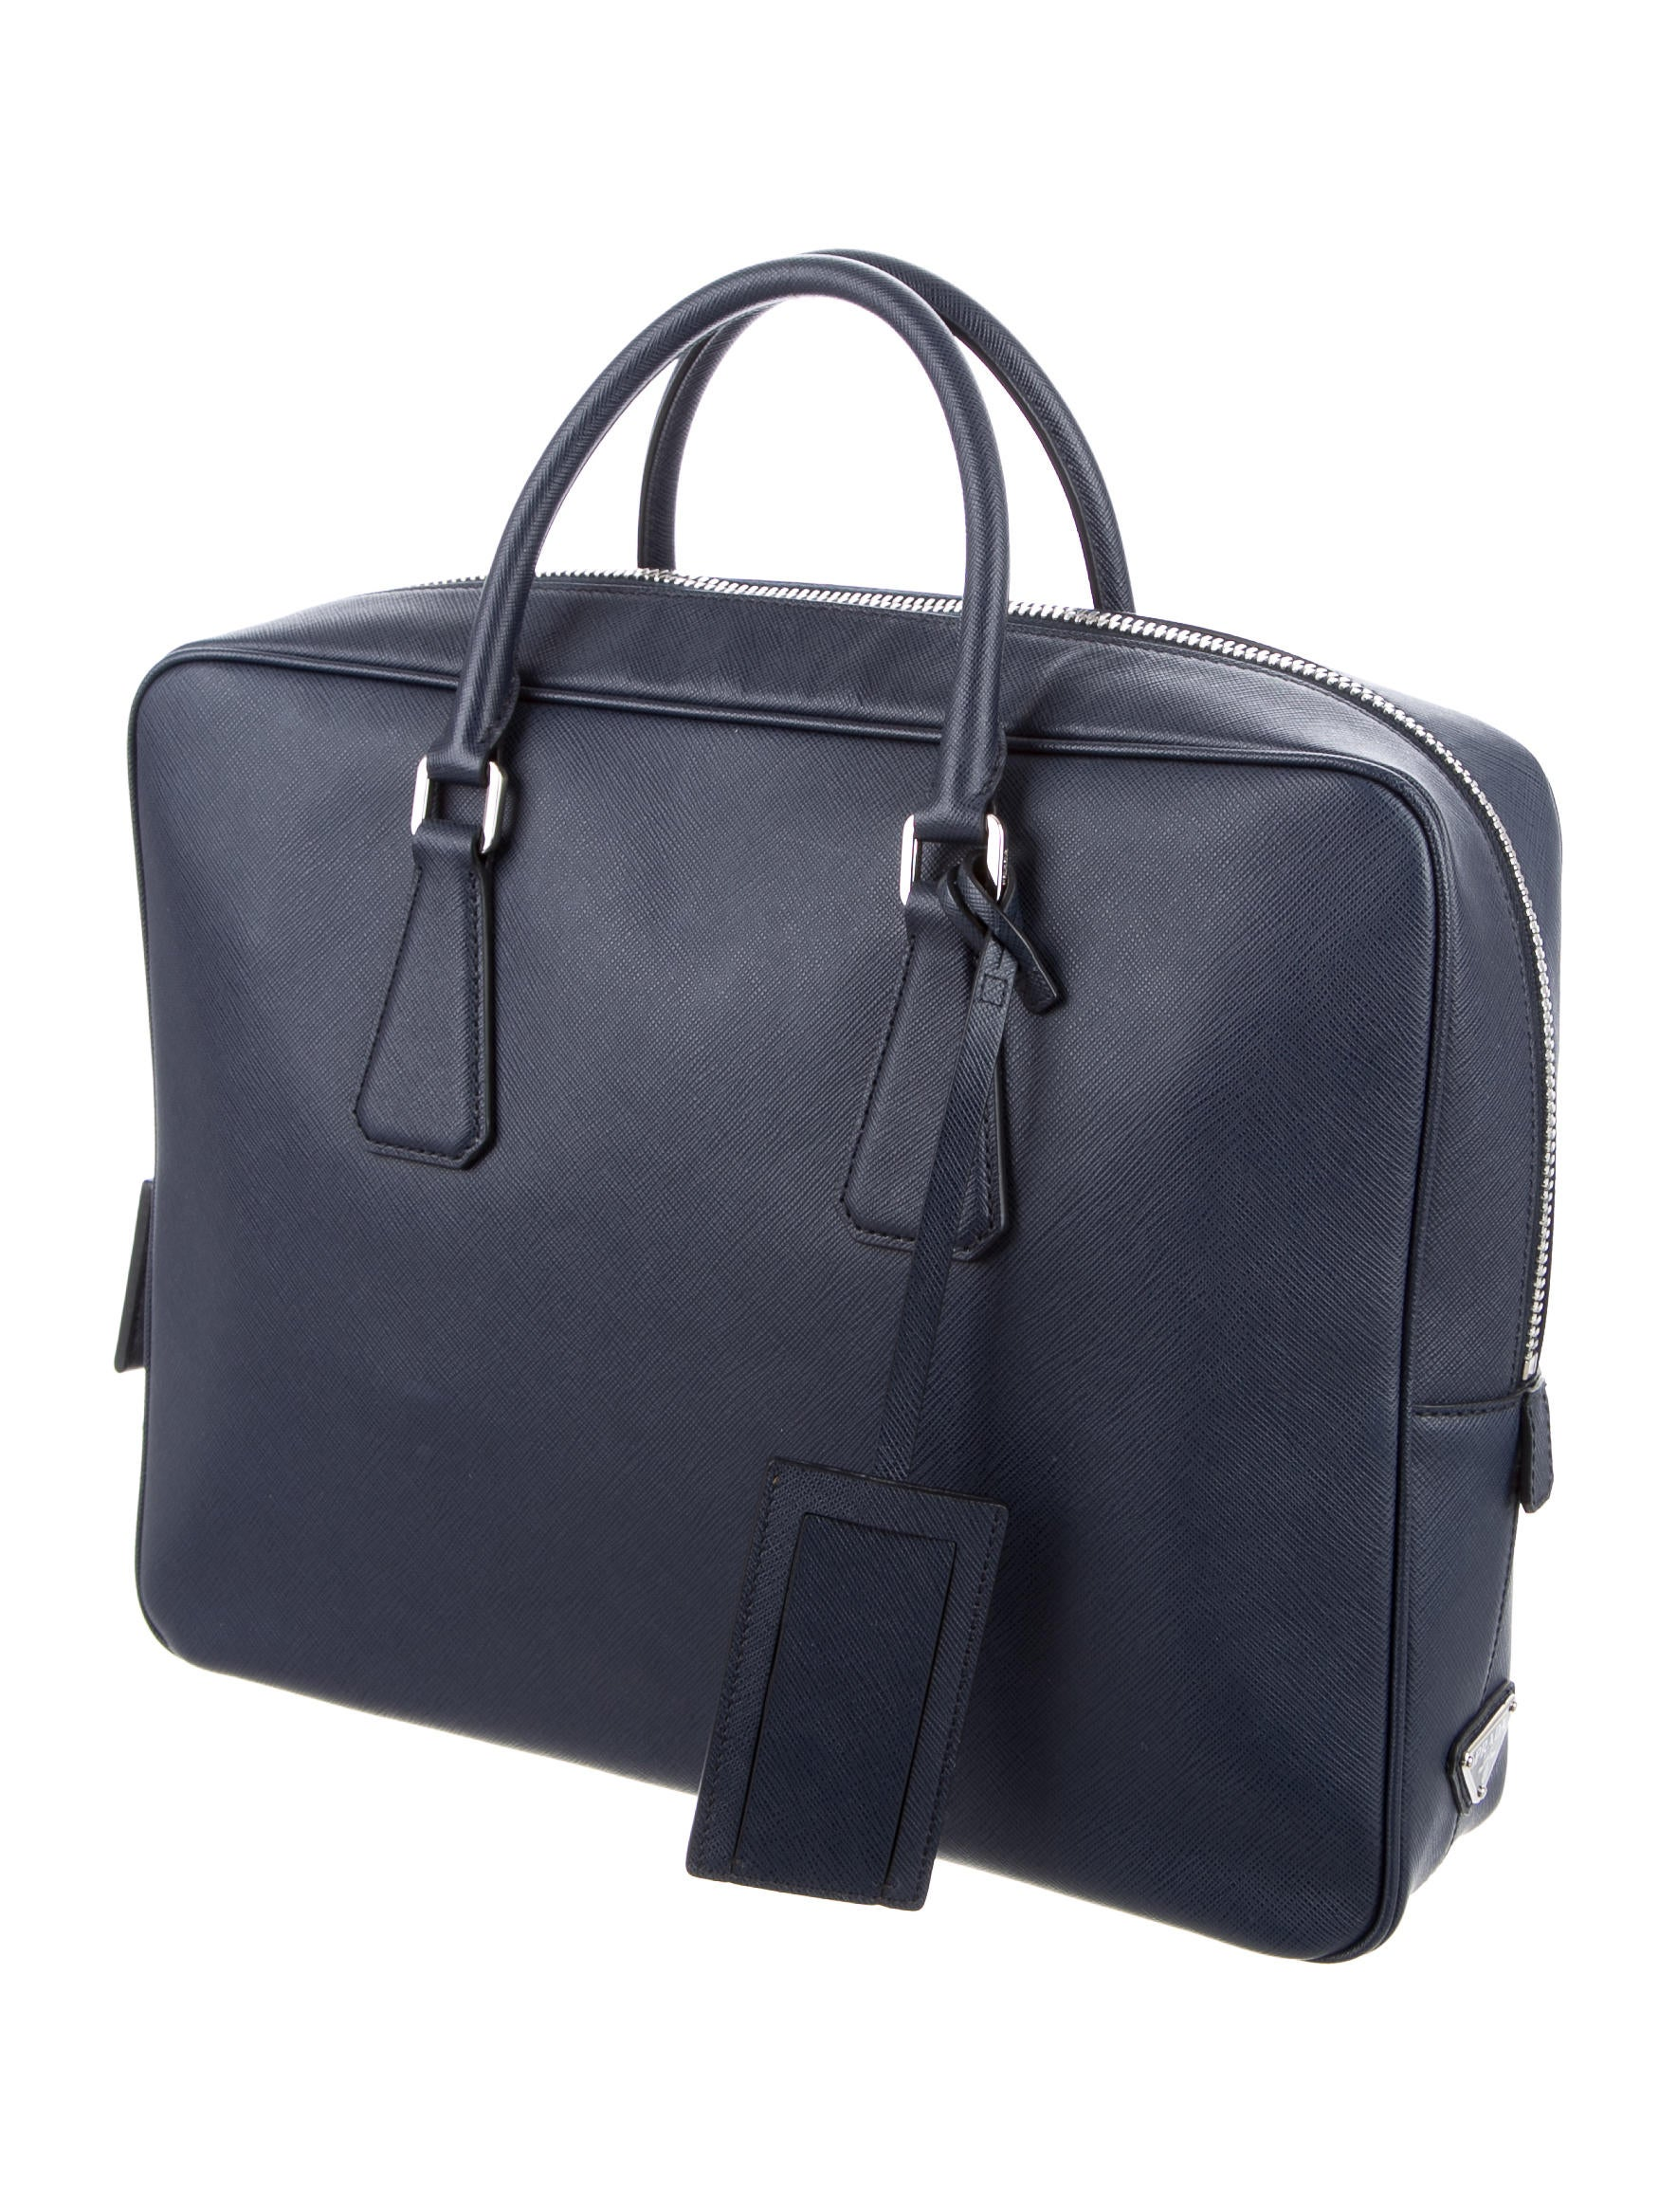 Prada Saffiano Leather Slim Briefcase w/ Tags - Bags ...